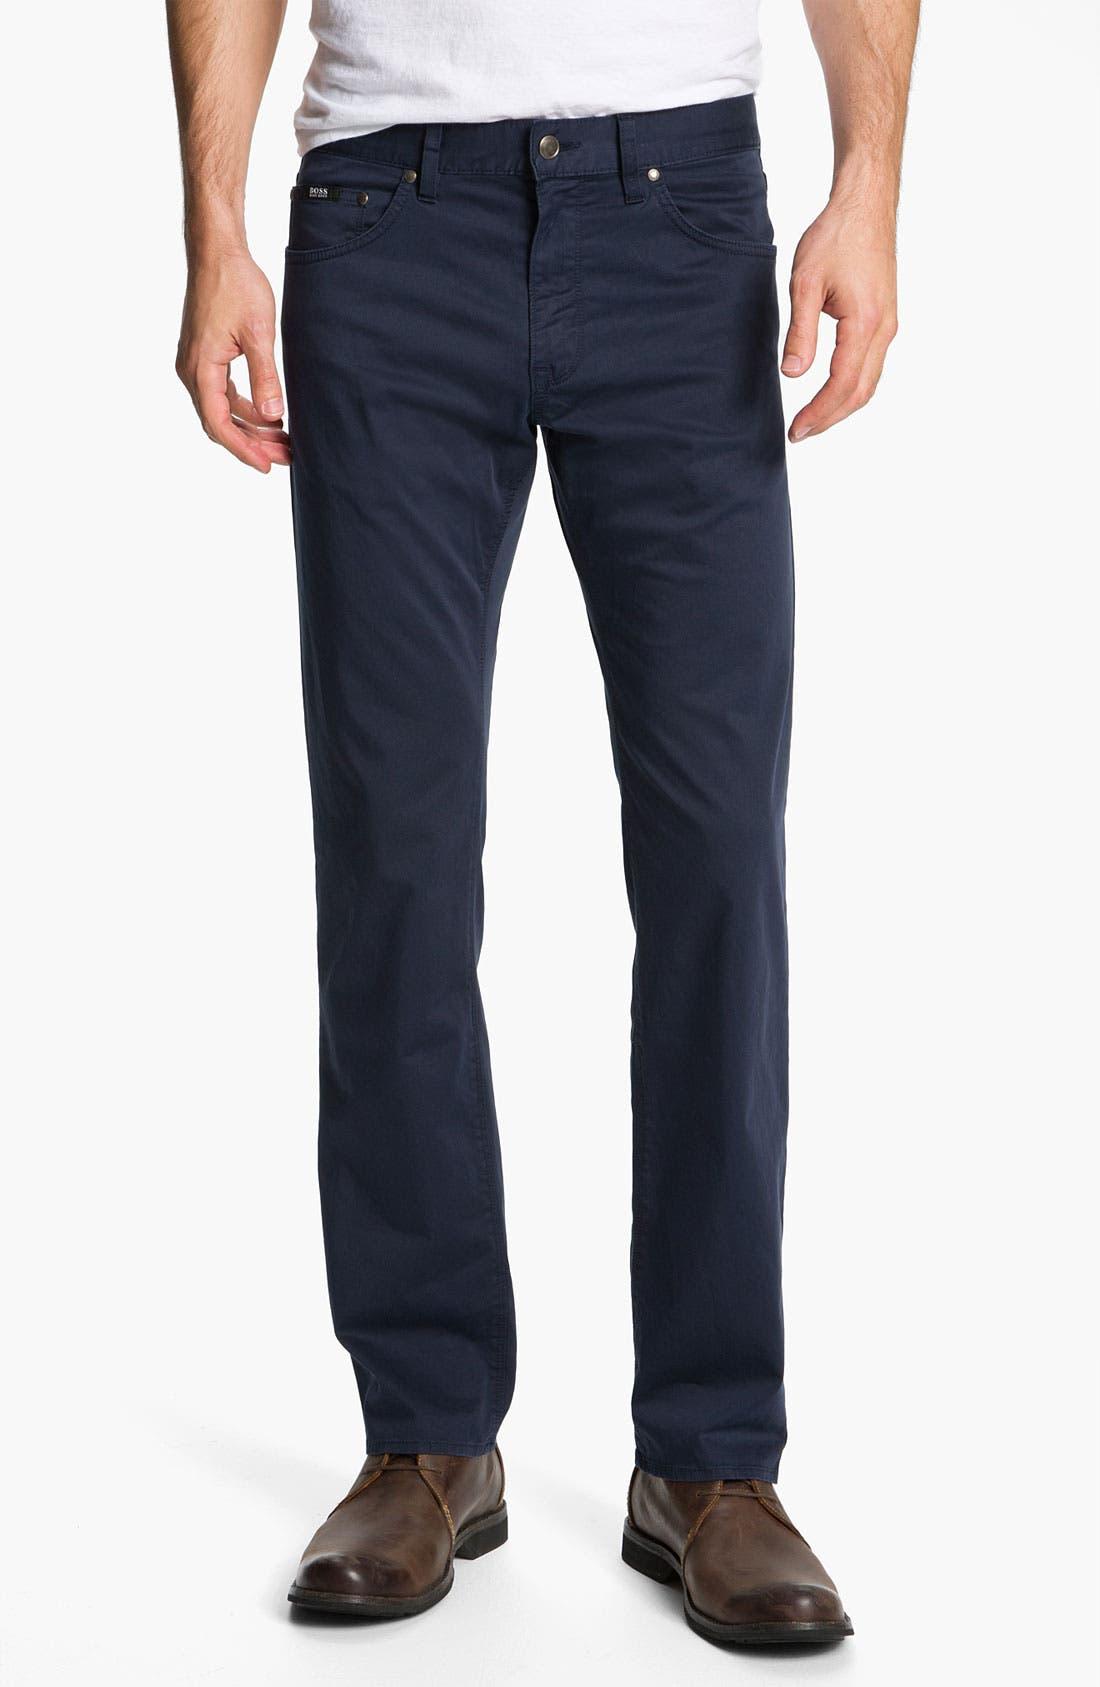 Alternate Image 1 Selected - BOSS Black 'Maine' Five Pocket Pants